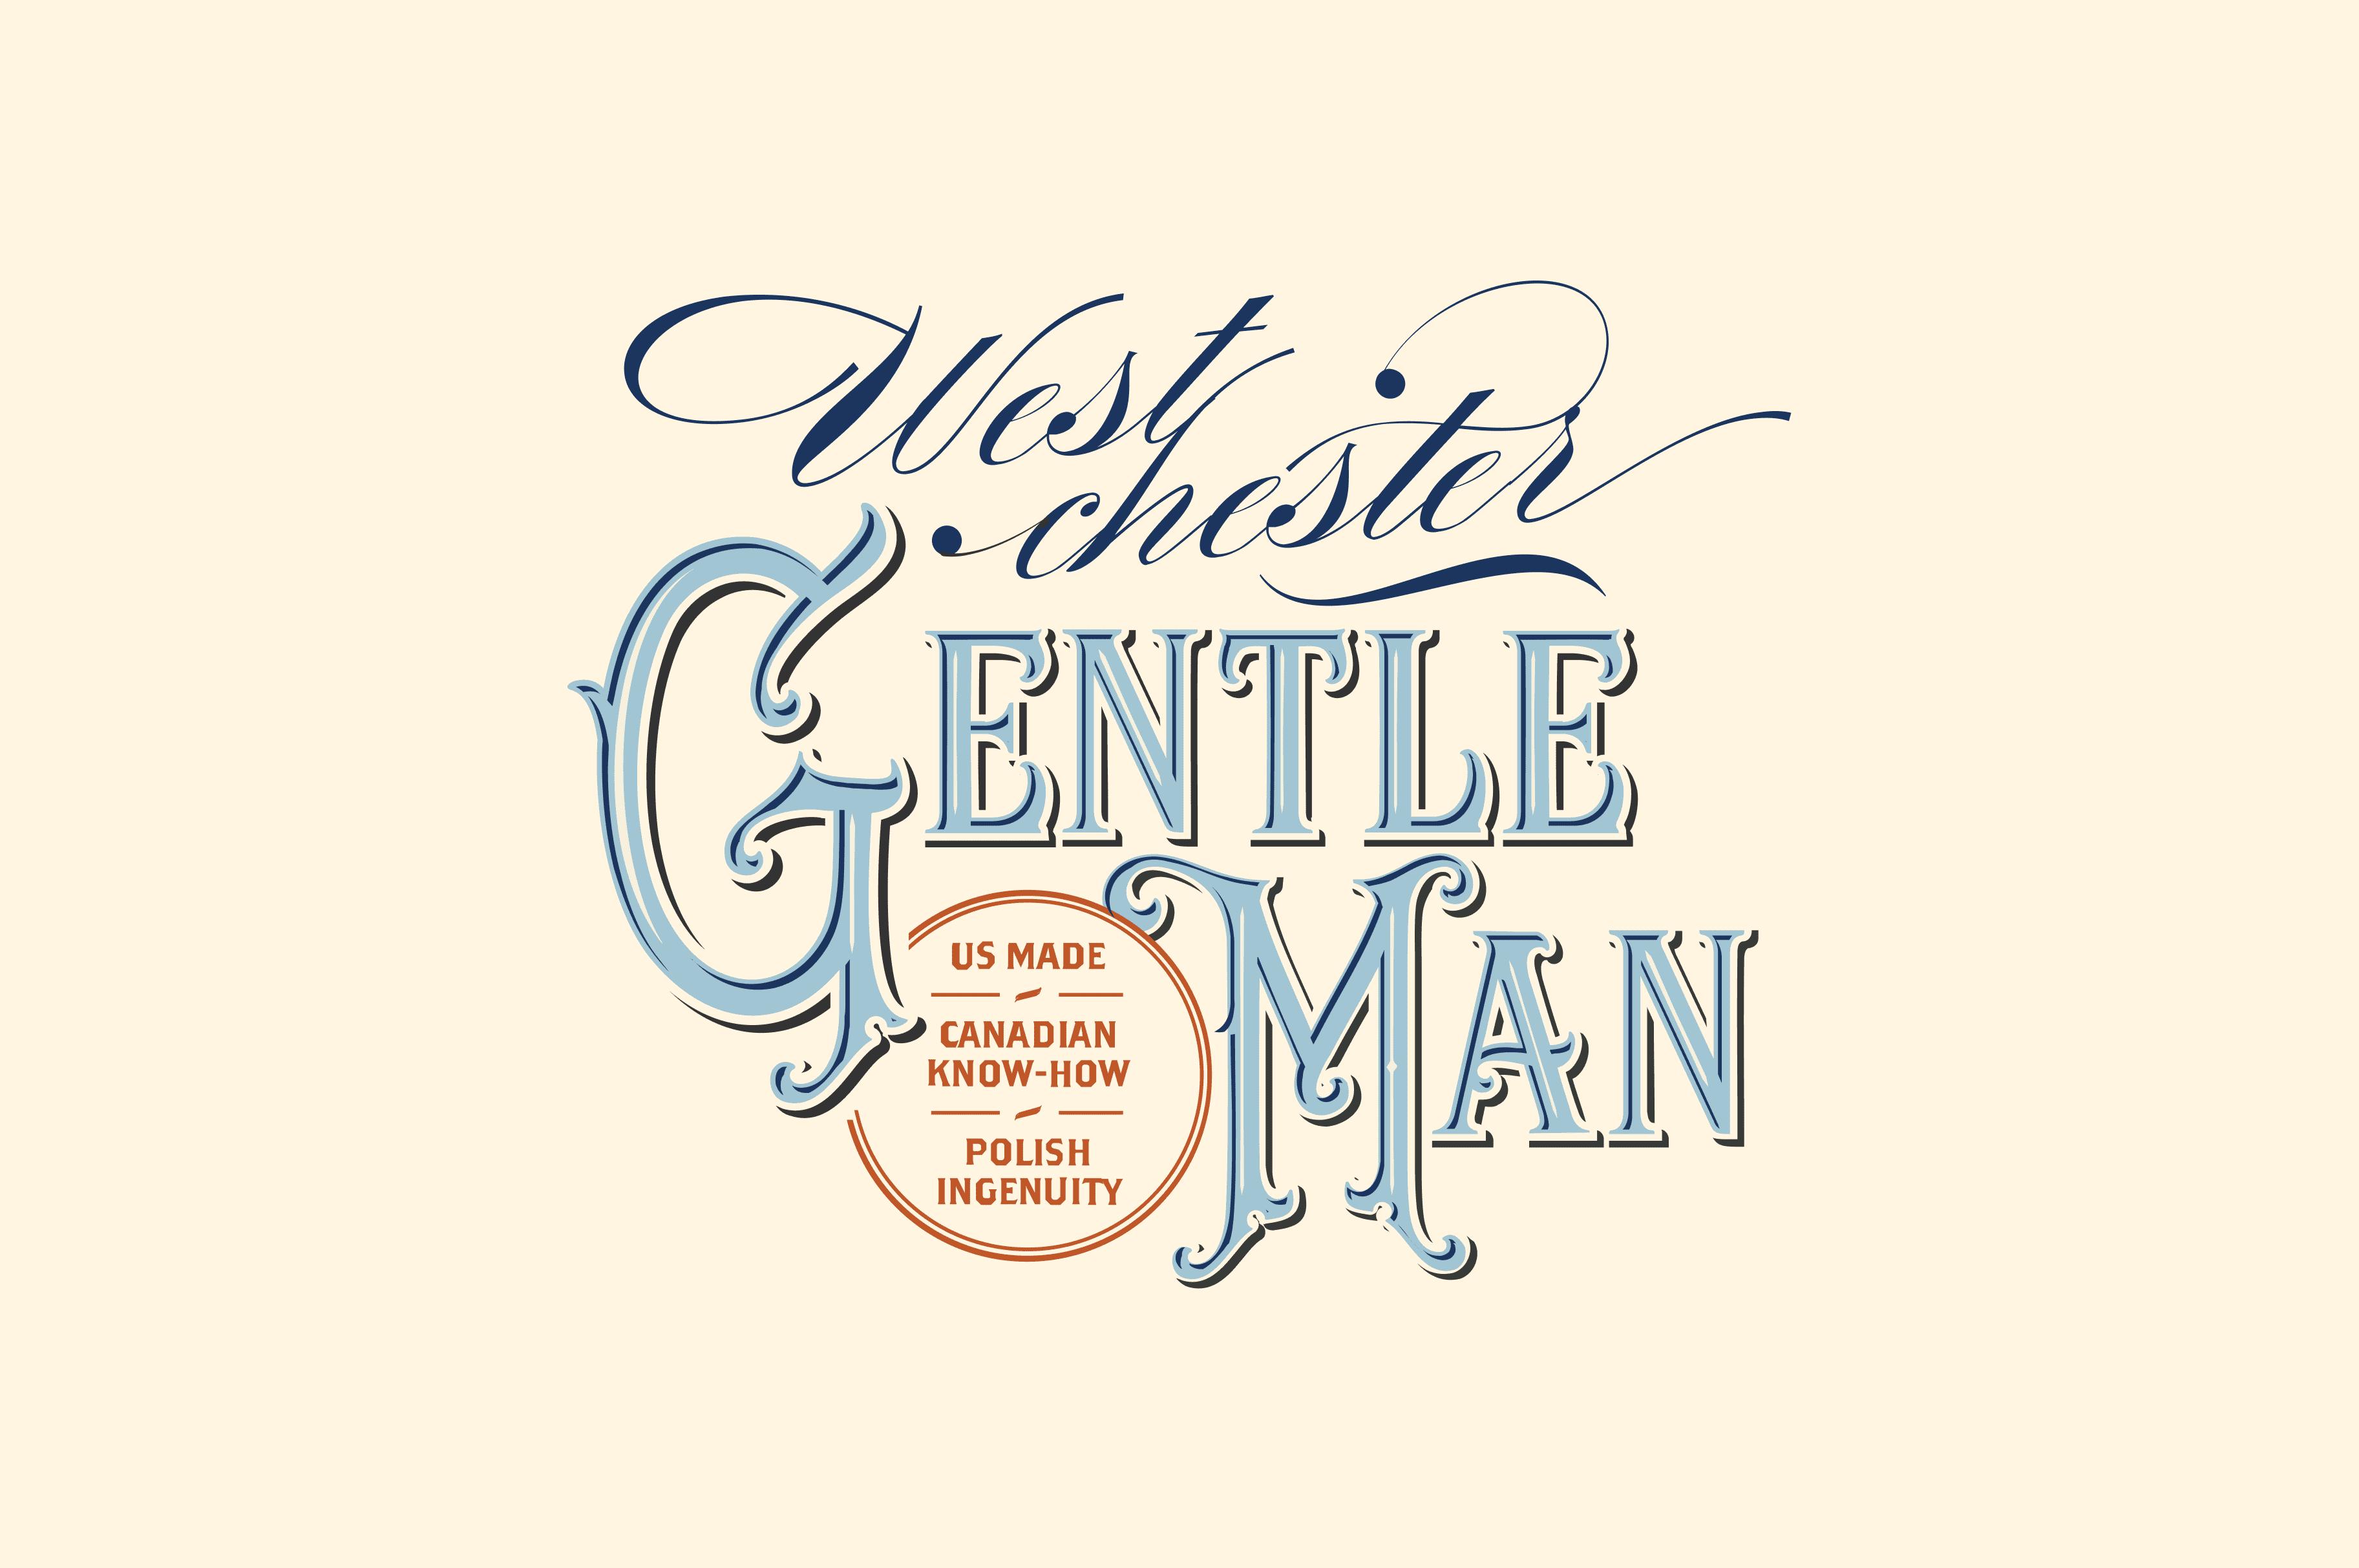 Westchester Gentleman logo